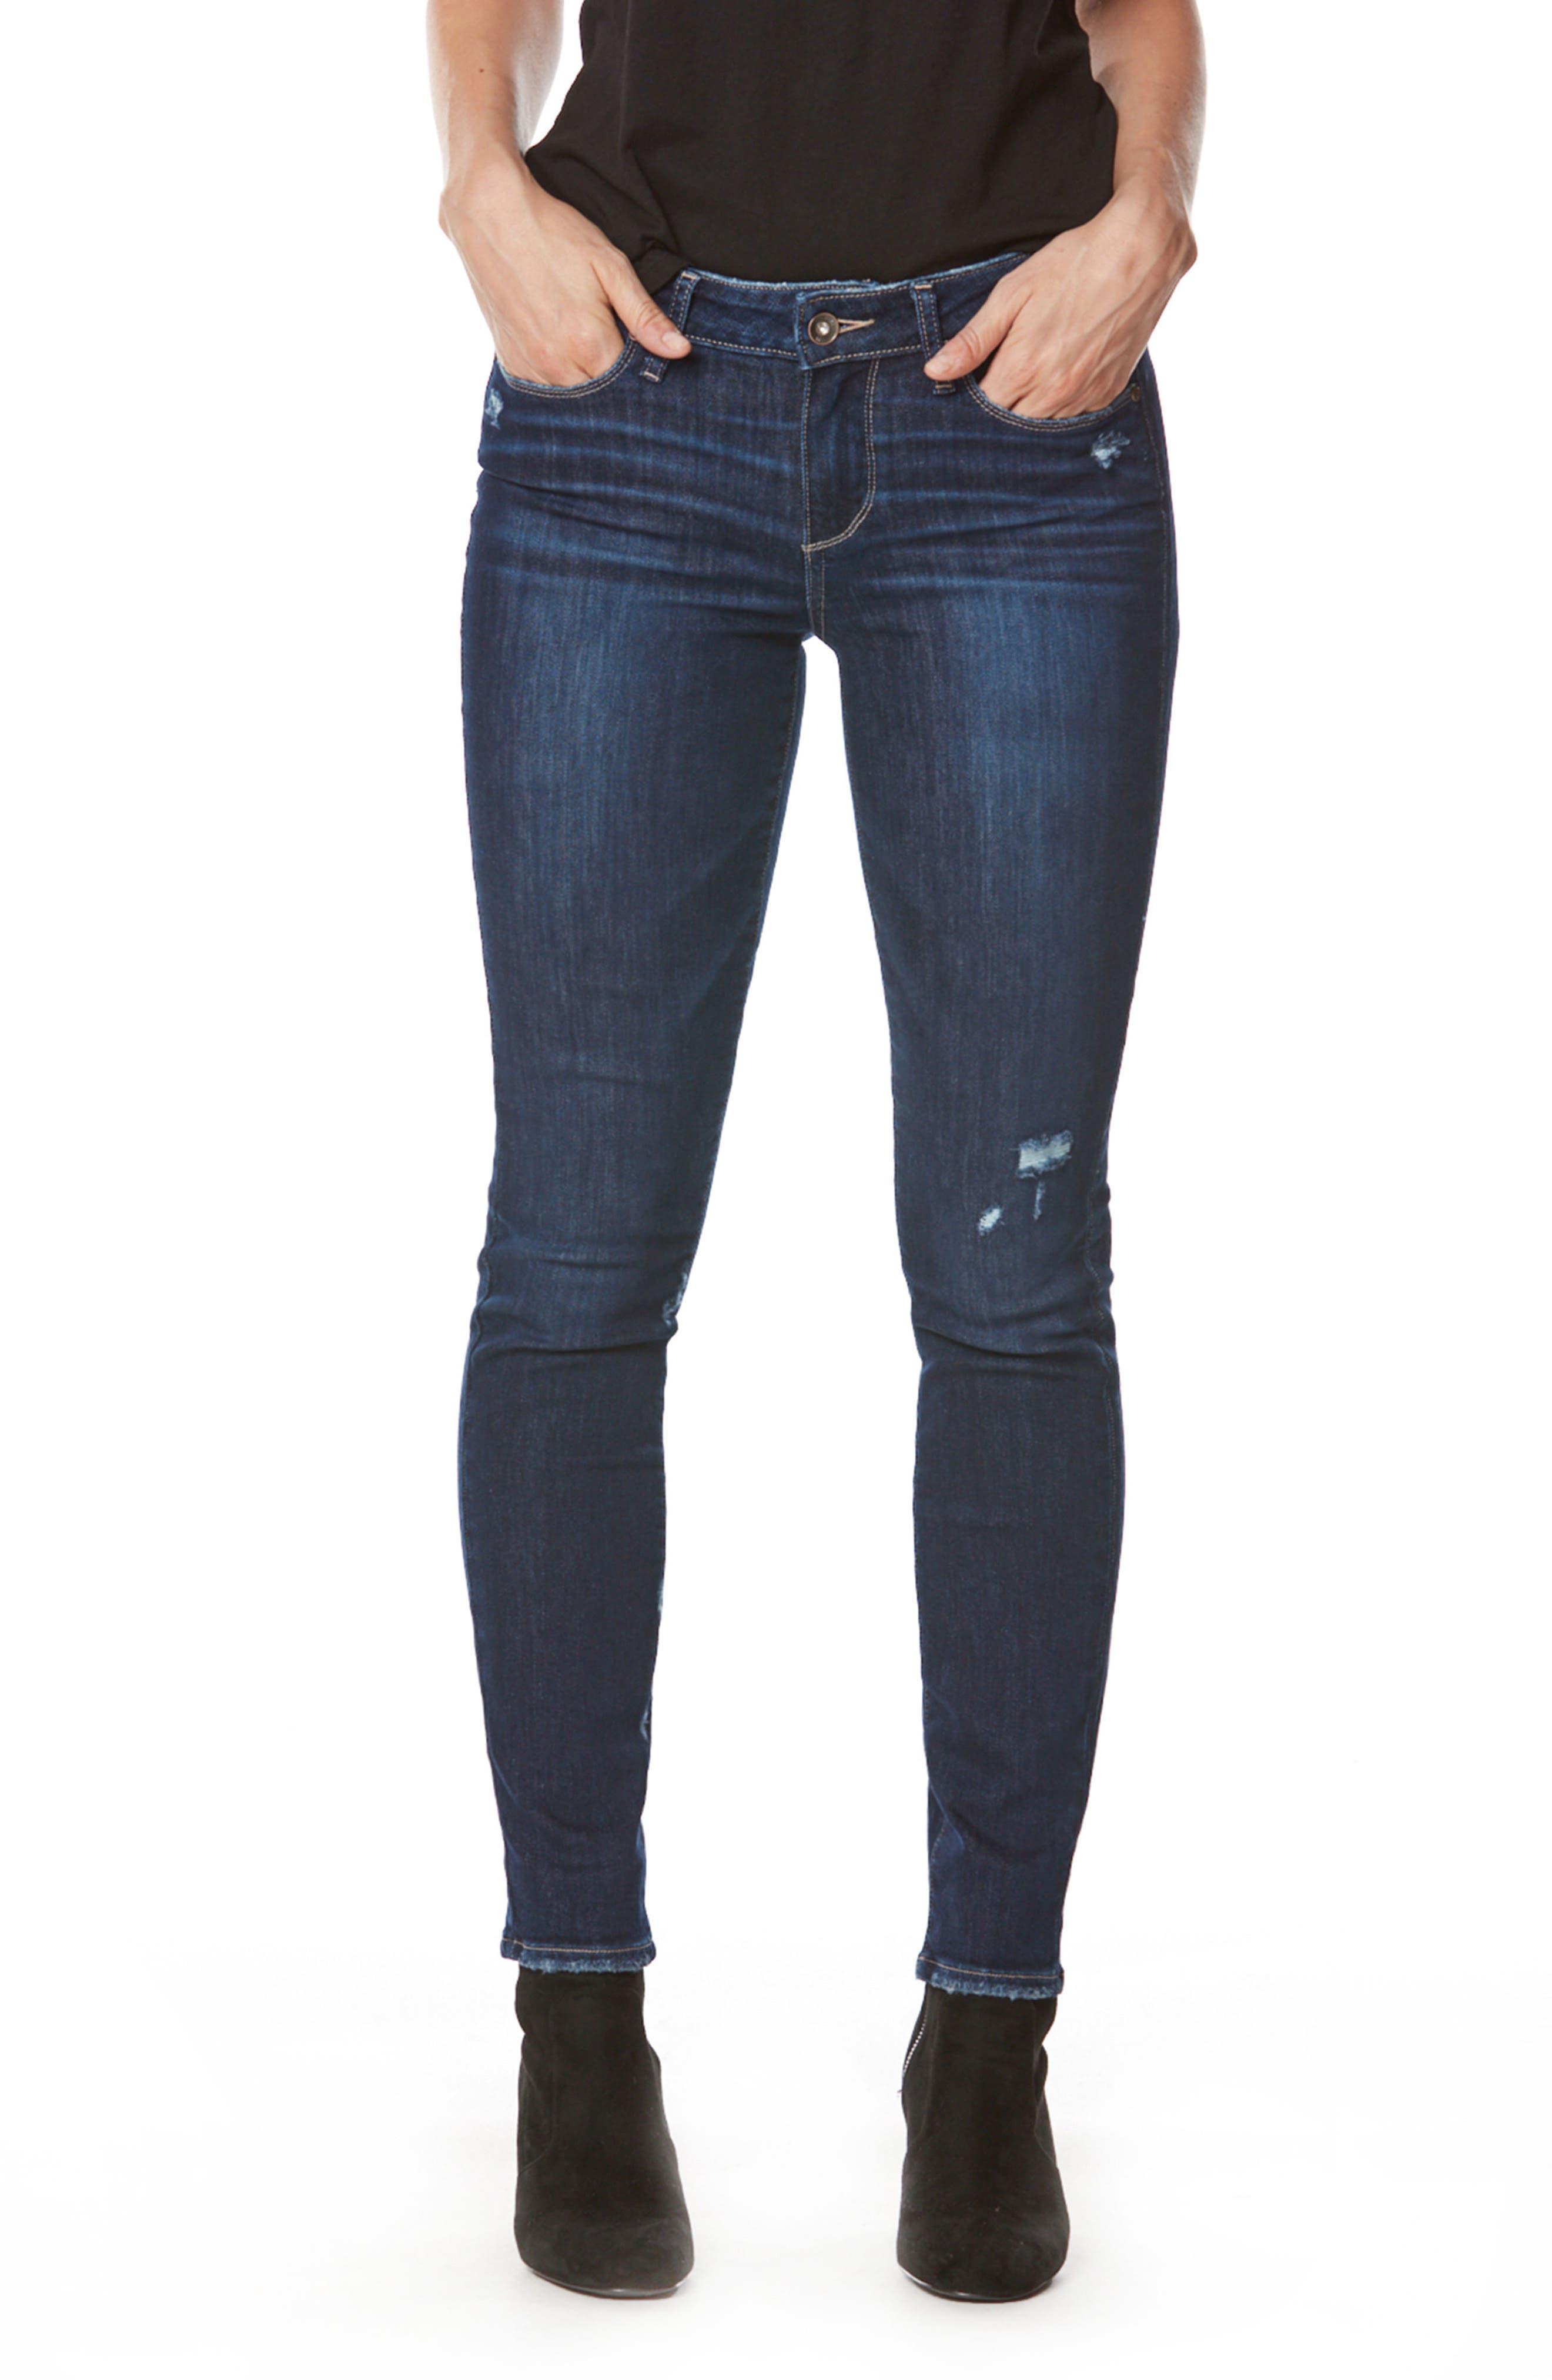 Main Image - PAIGE Transcend - Verdugo Ultra Skinny Jeans